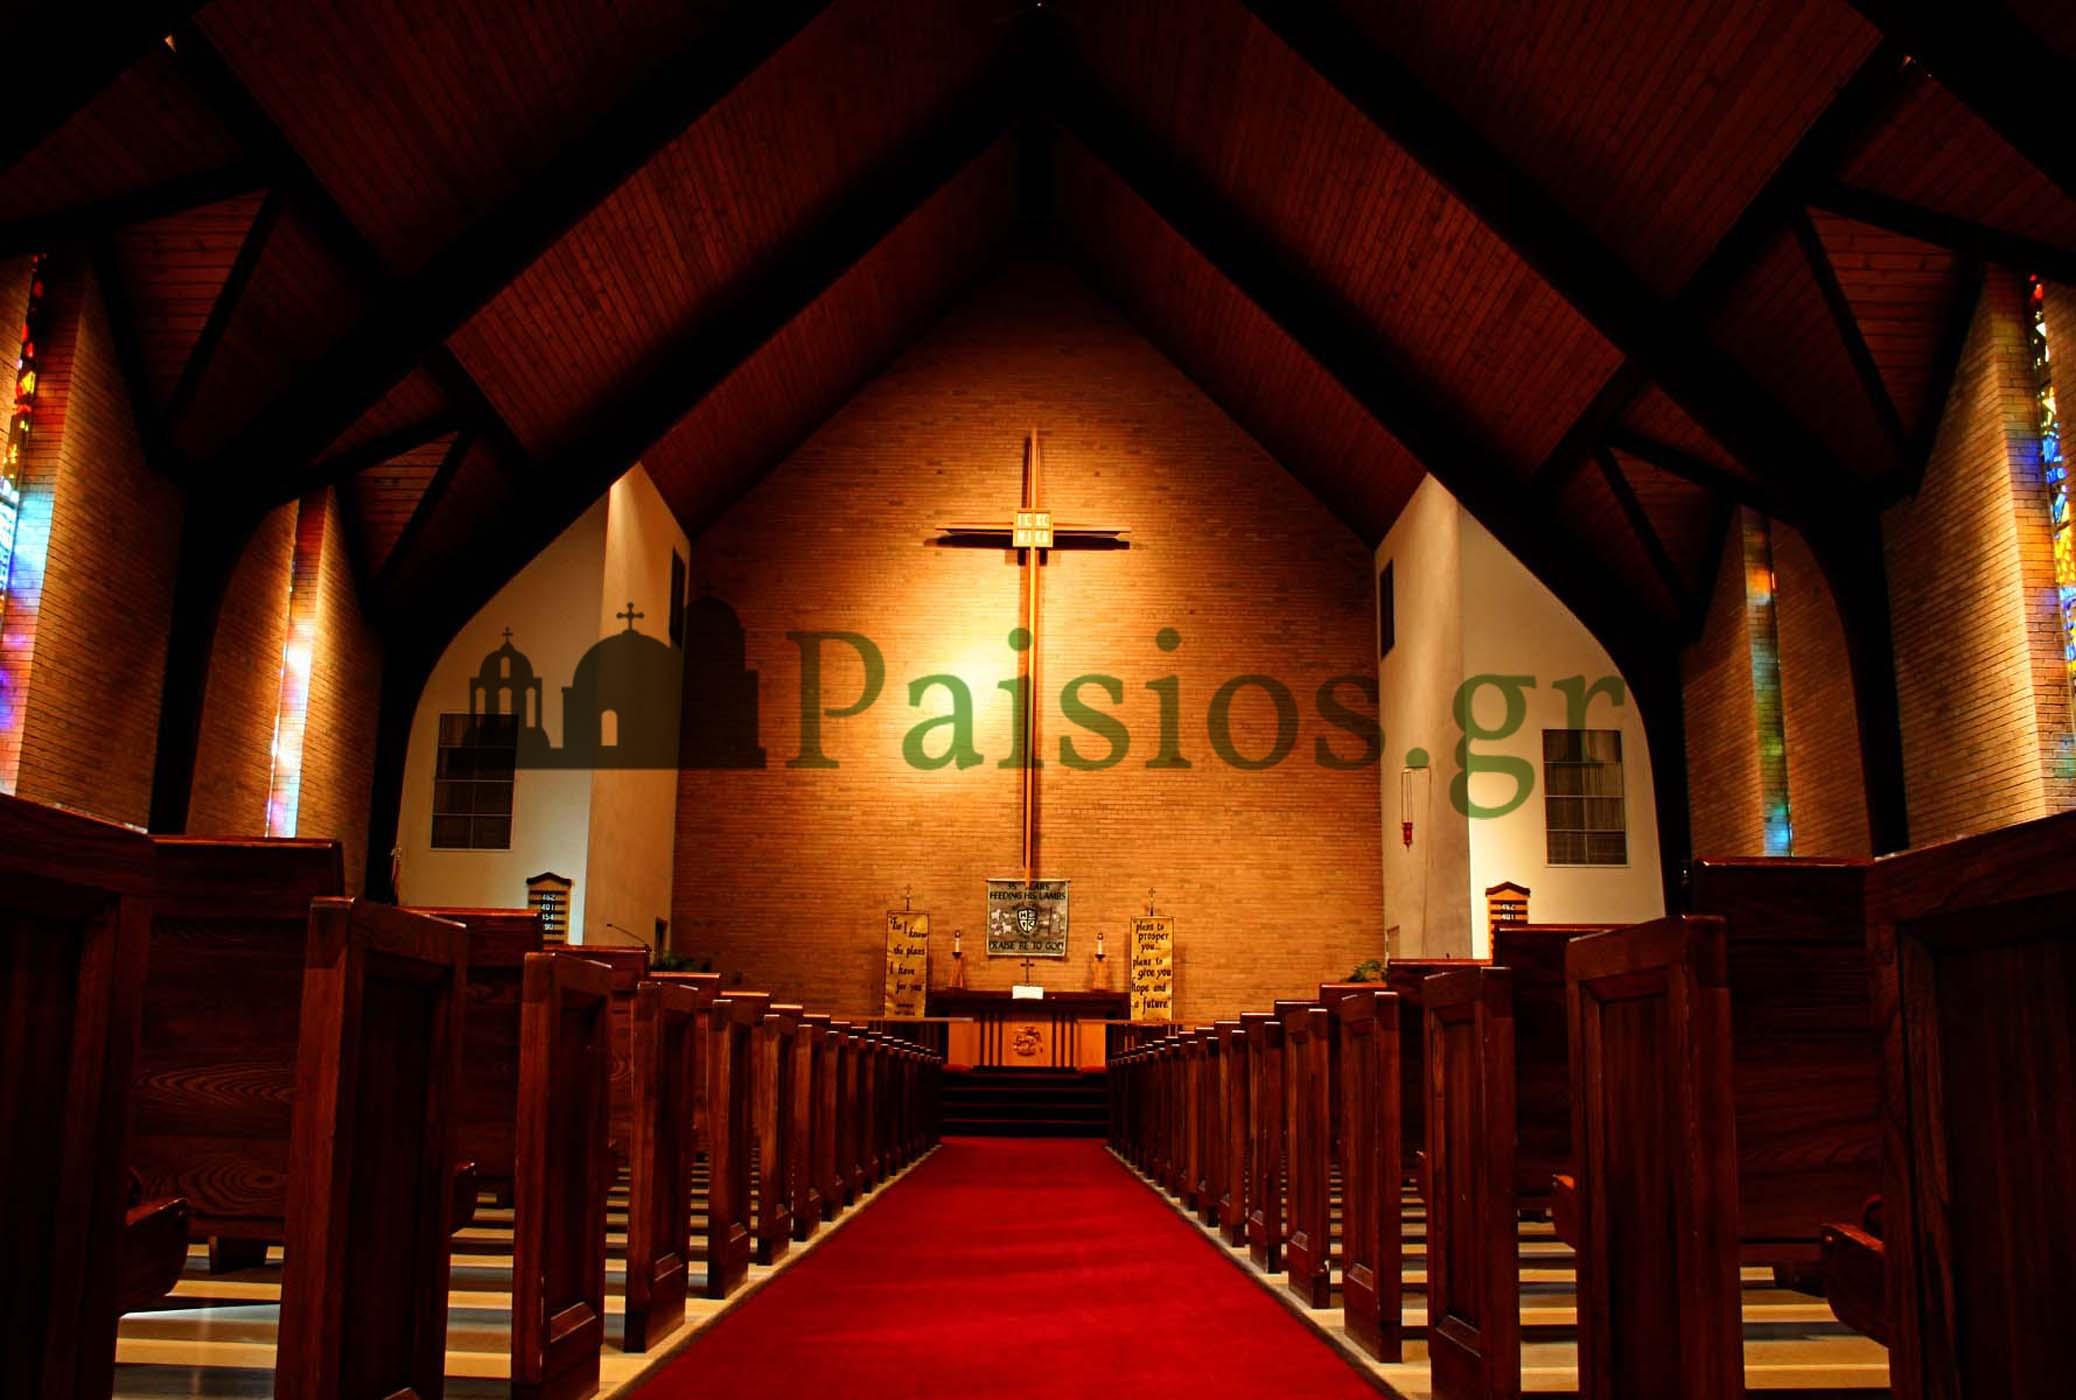 Paisios Adikia, Παισιος Αδικία, Άγιος Παίσιος Υπομονή, Θεός, Ευεργέτηση, Δικαιοσύνη, Απανθρωπιά, Συμβουλή Παίσιου, Ανάπαυση, Ταμιευτήριο του Θεού, Πλάσματα Θεού, Ευγνωμοσύνη